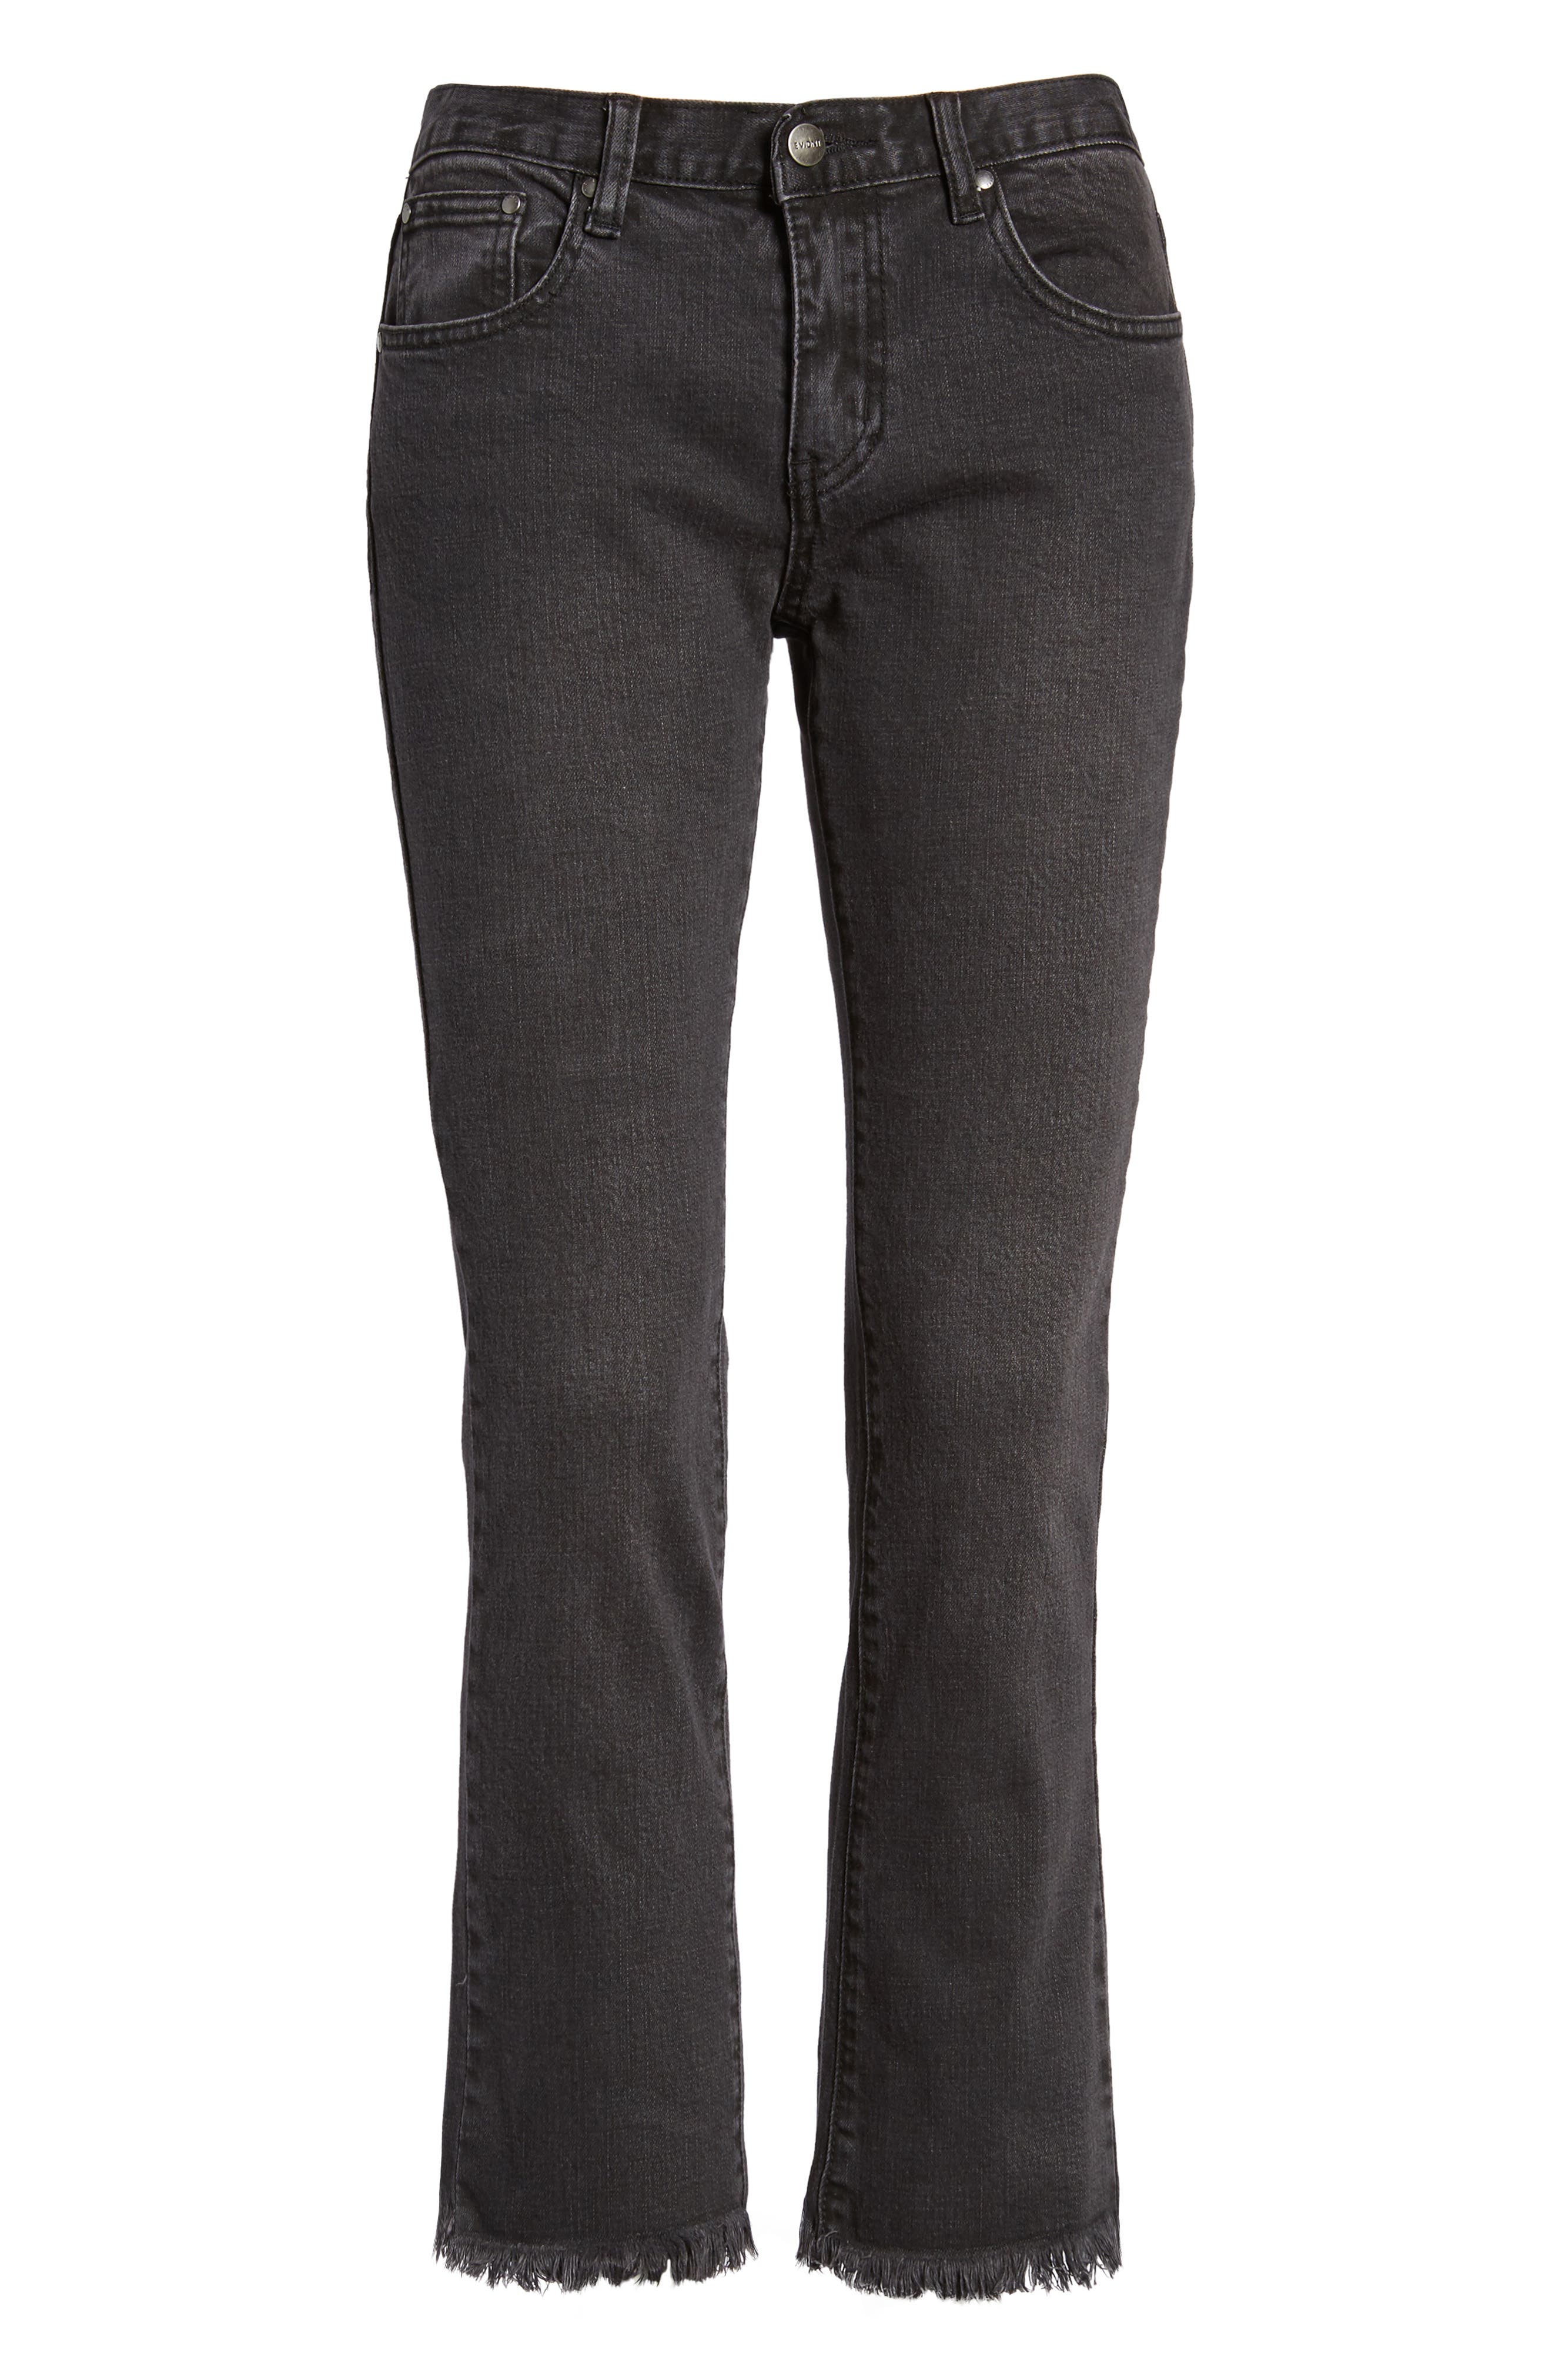 Hermosa Fray Hem Ankle Skinny Jeans,                             Alternate thumbnail 7, color,                             Black